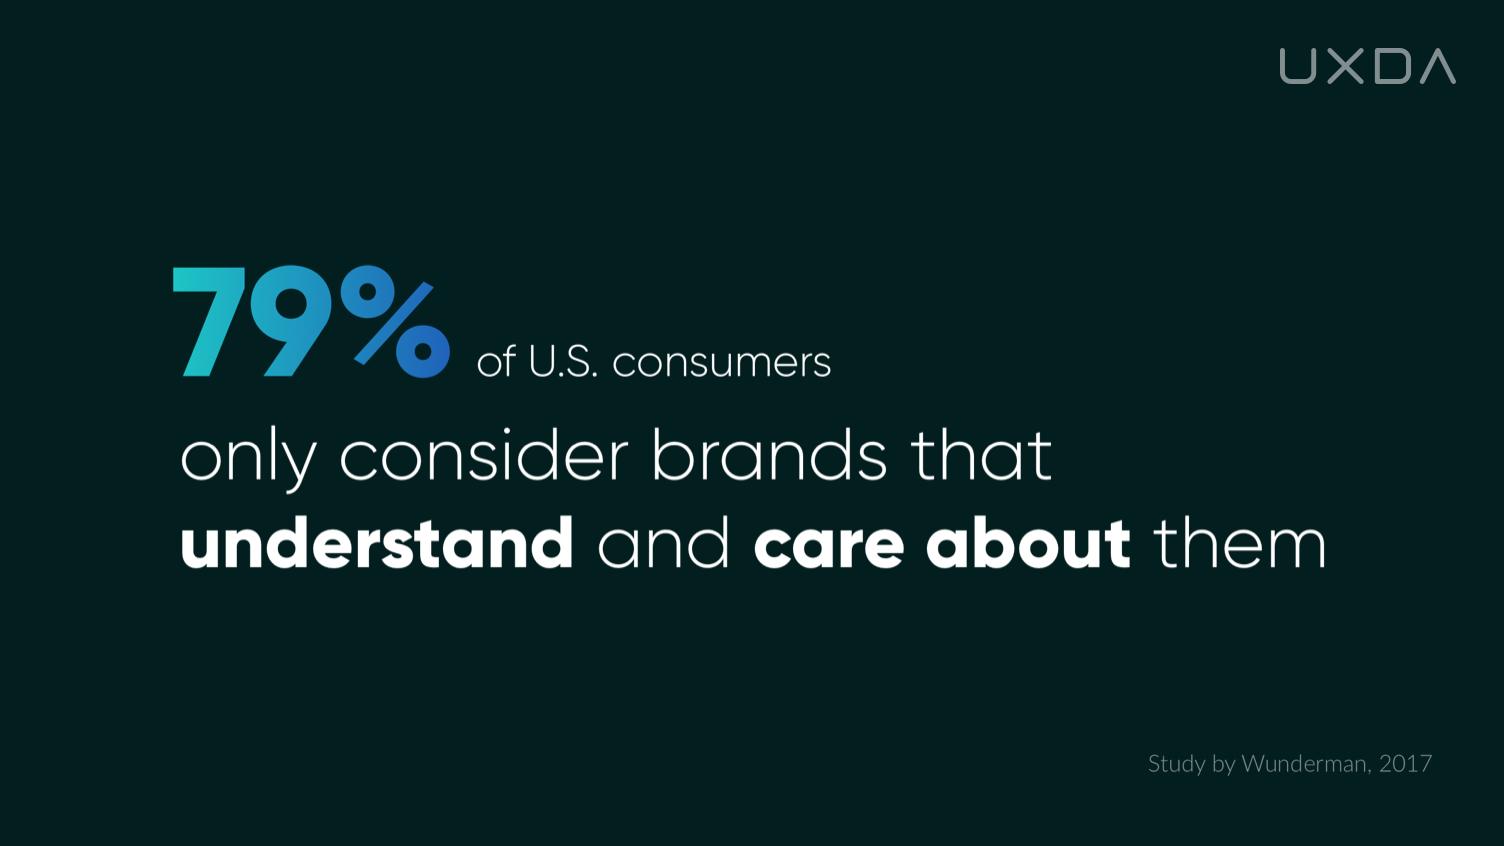 digital-banking-customer-experience-trends-2.jpg